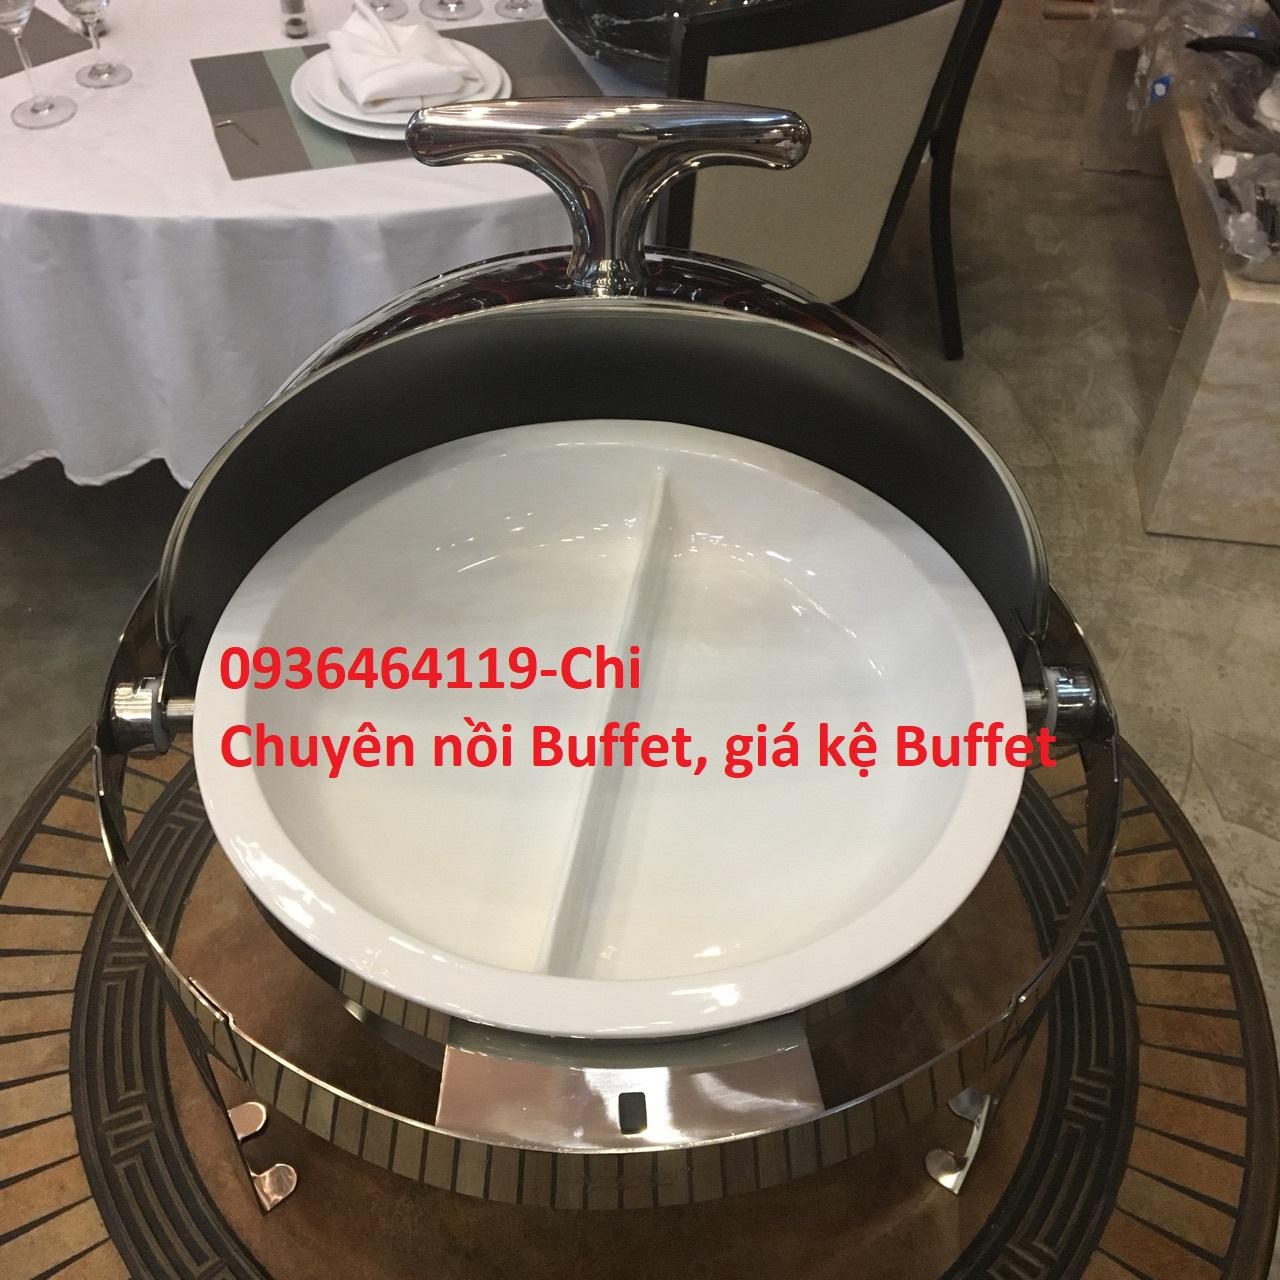 1 Nồi buffet kính, nồi hâm buffet hai ngăn giá rẻ